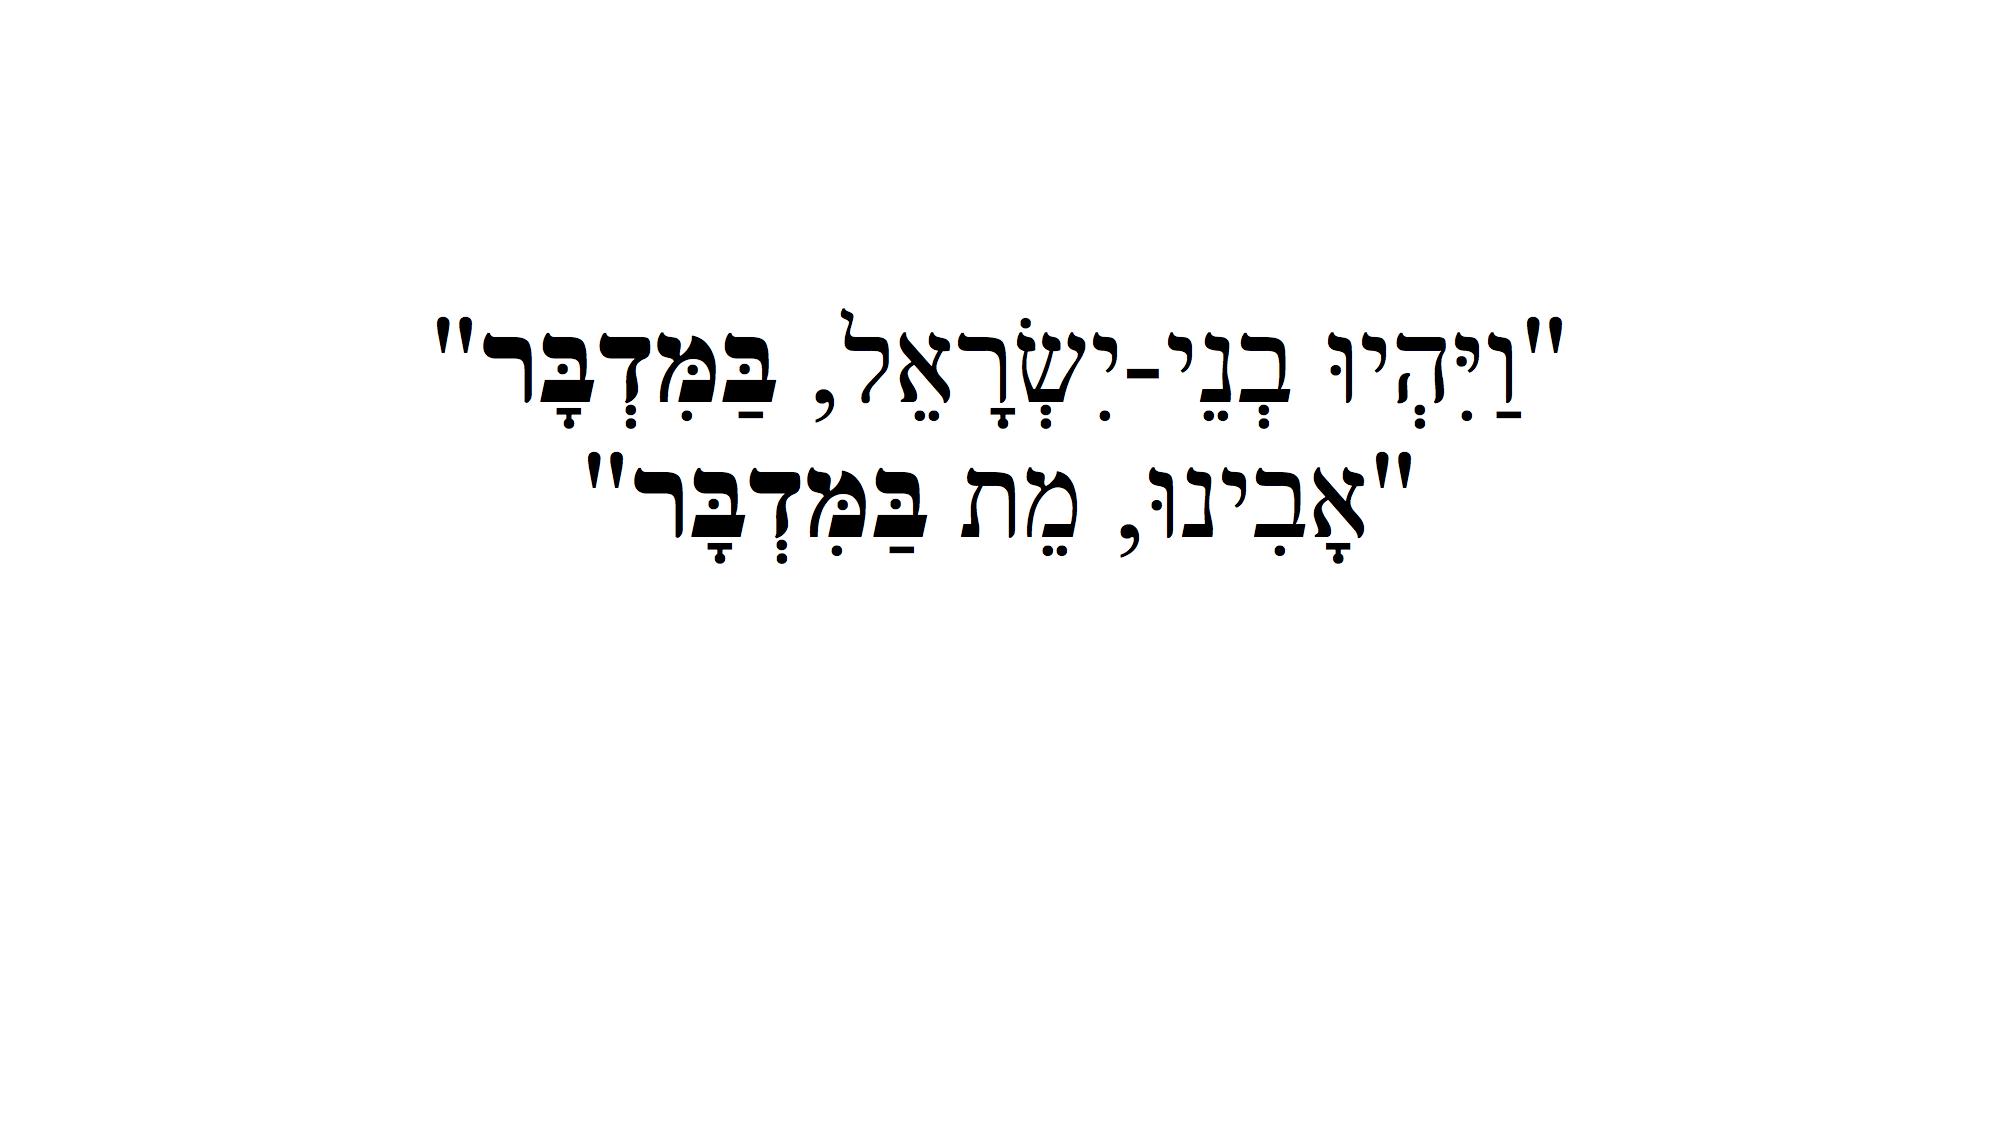 Gzeirah Shavah